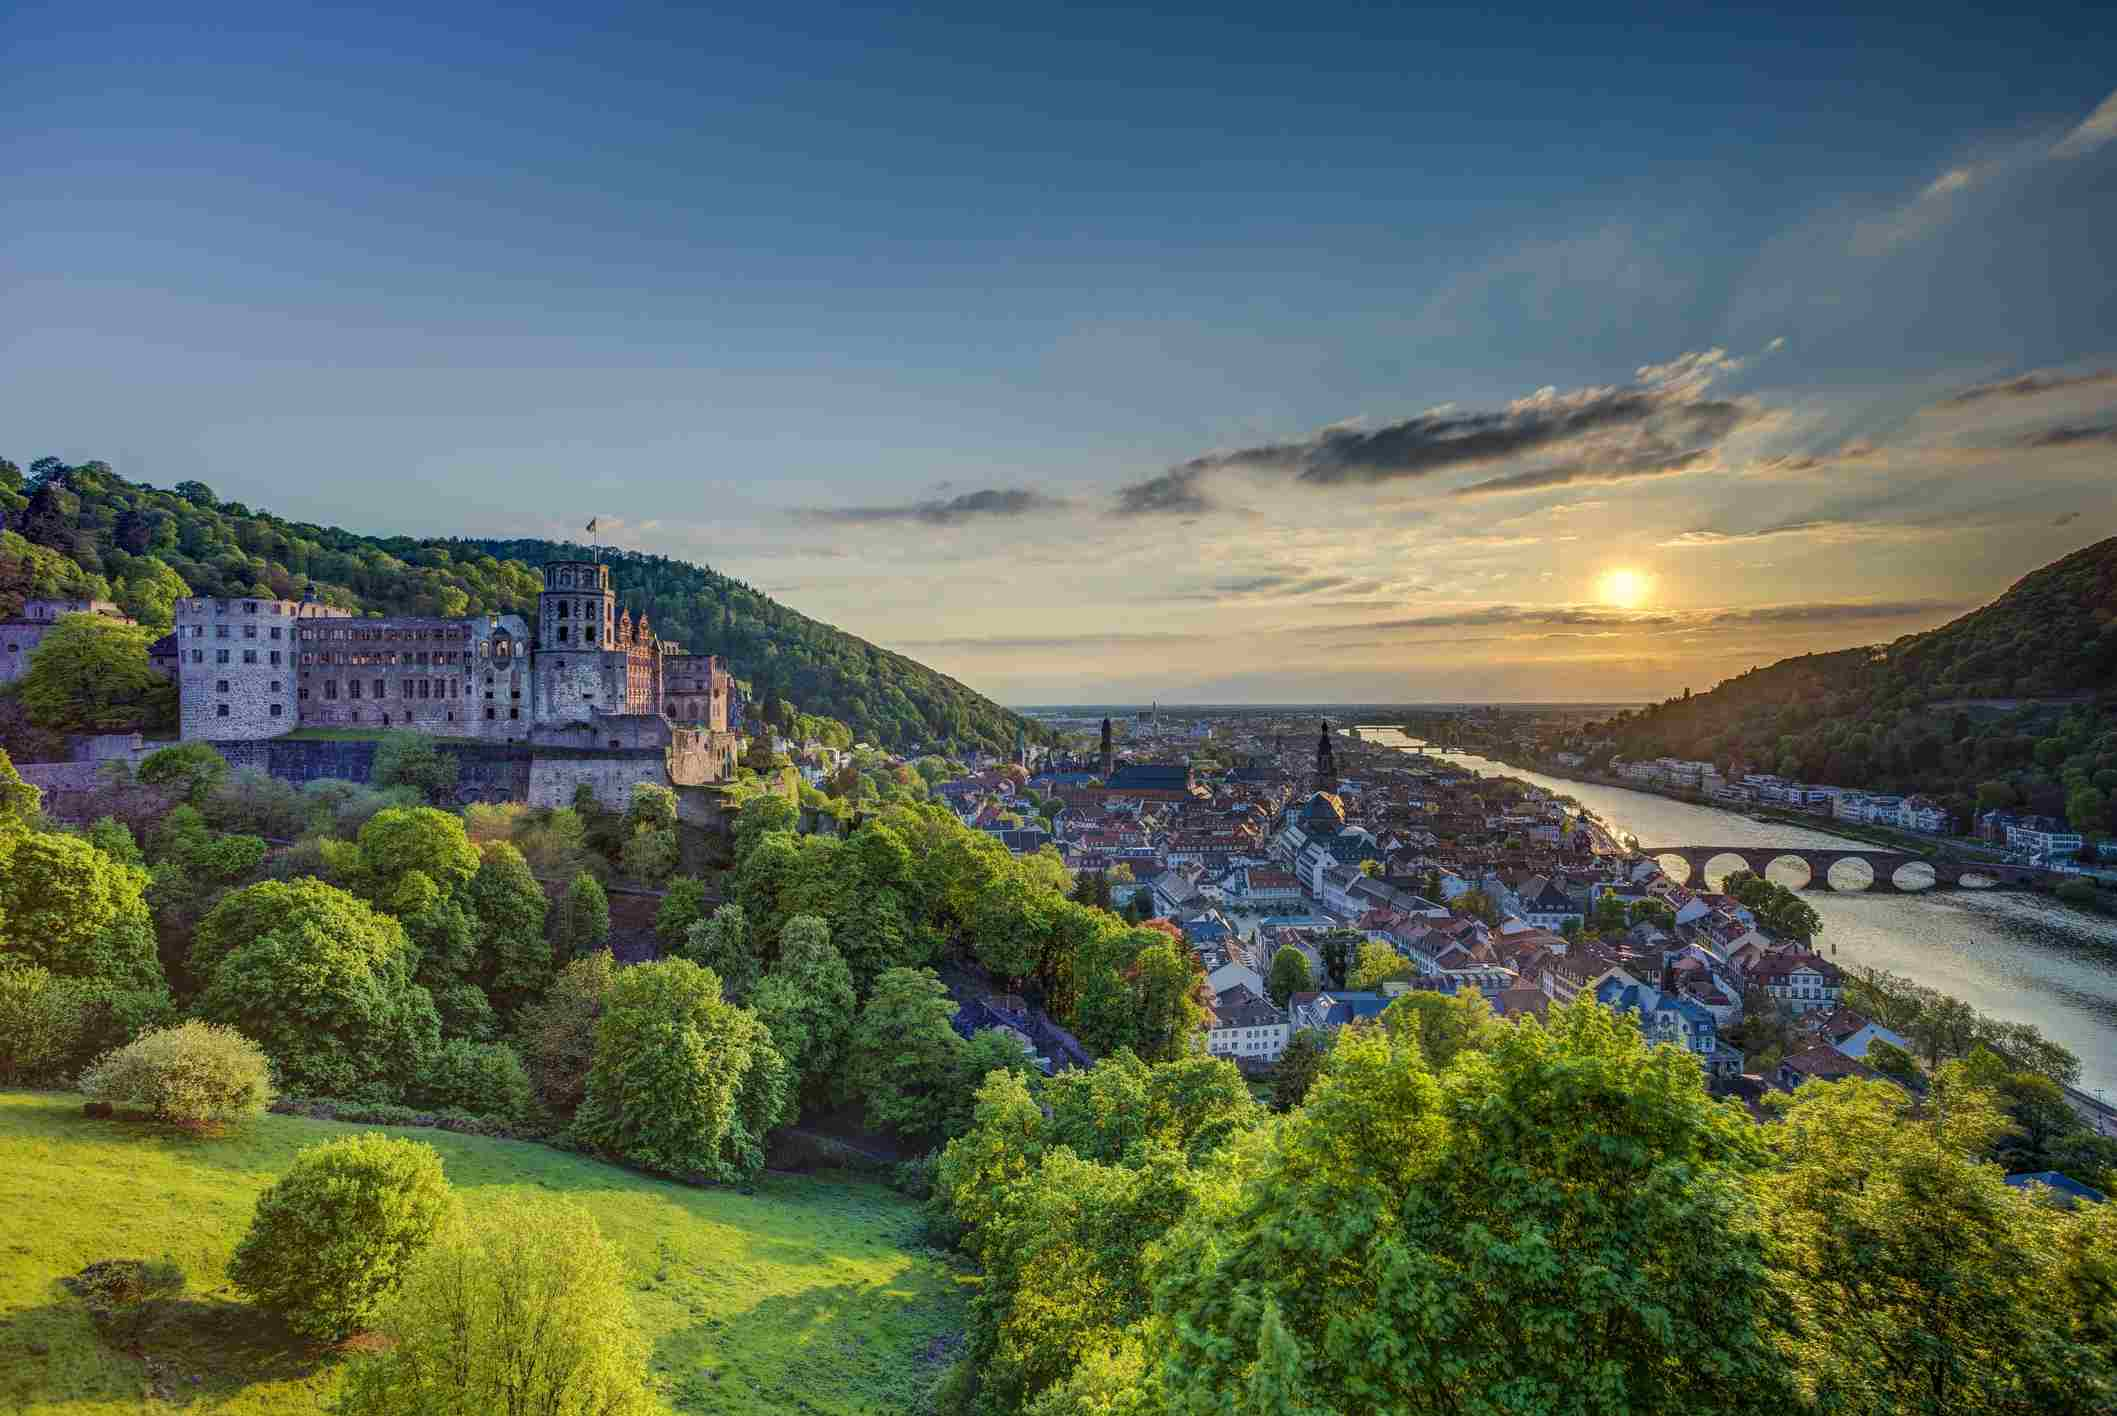 Germany, Heidelberg, Heidelberg Castle and Neckar River